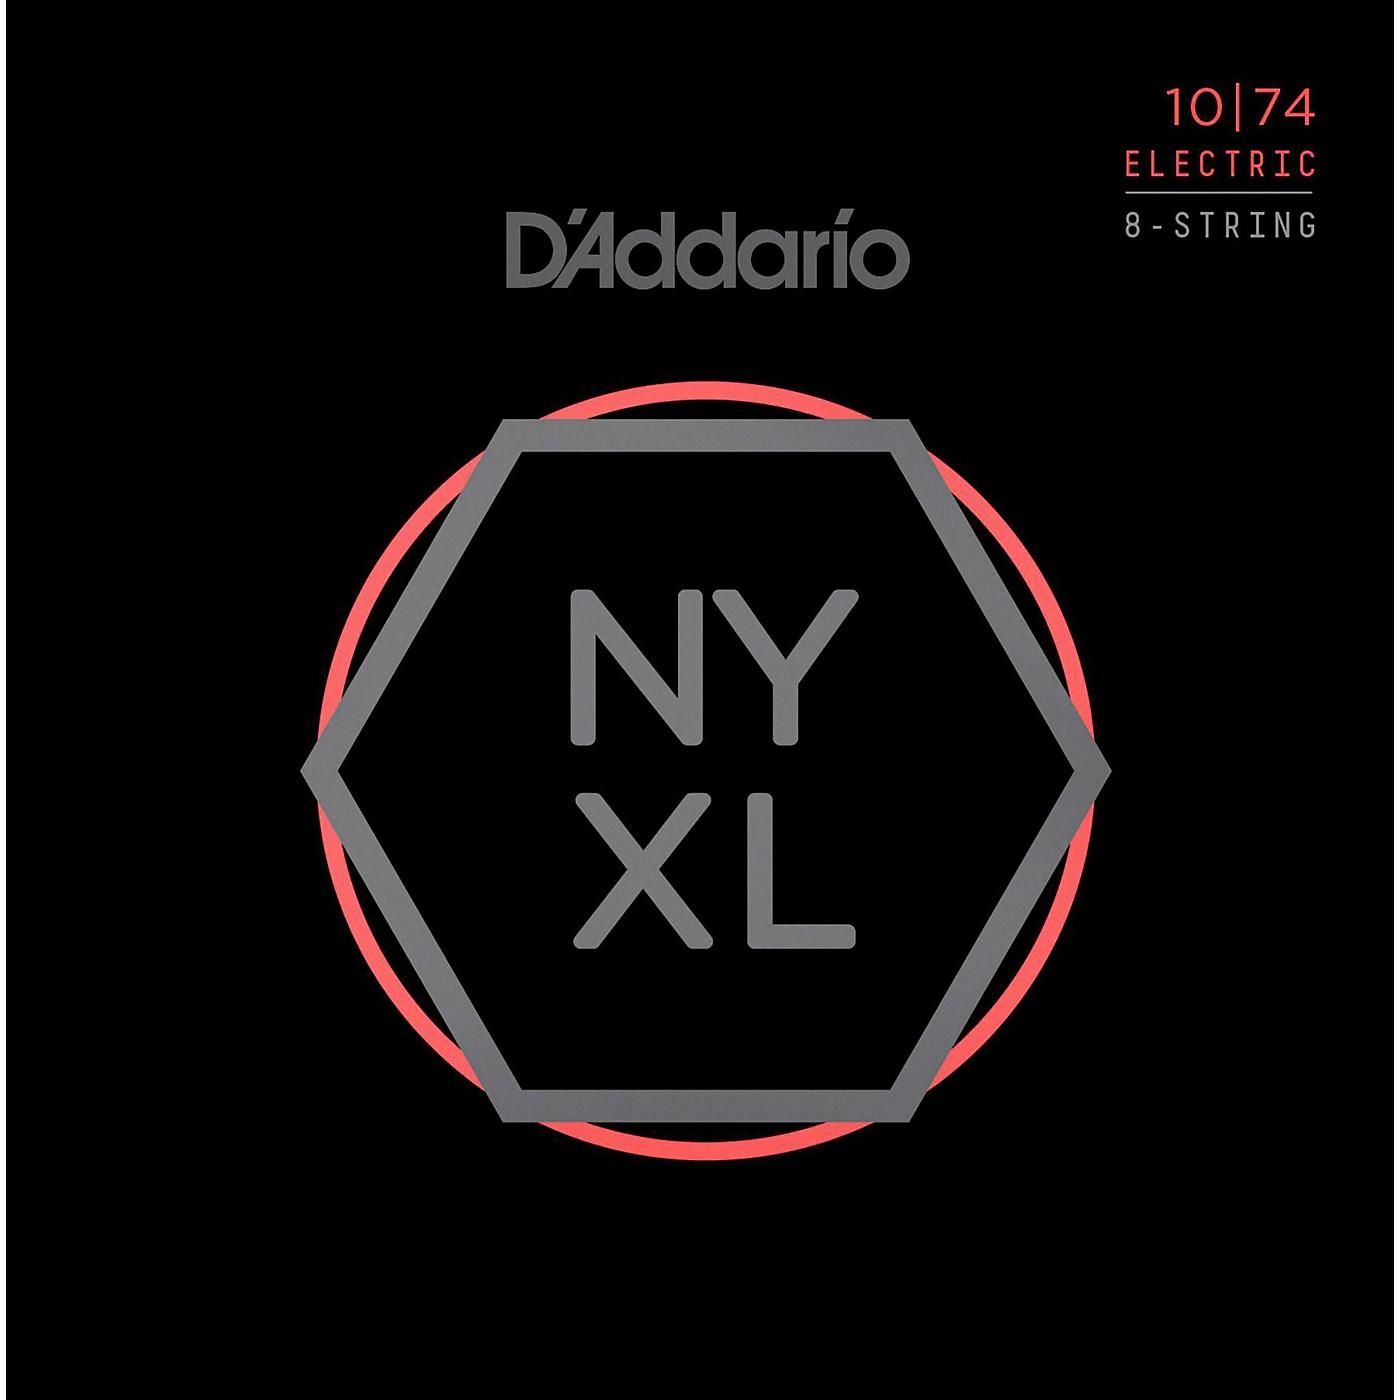 D'Addario NYXL1074 8-String Light Top/Heavy Bottom Nickel Wound Electric Guitar Strings (10-74) thumbnail